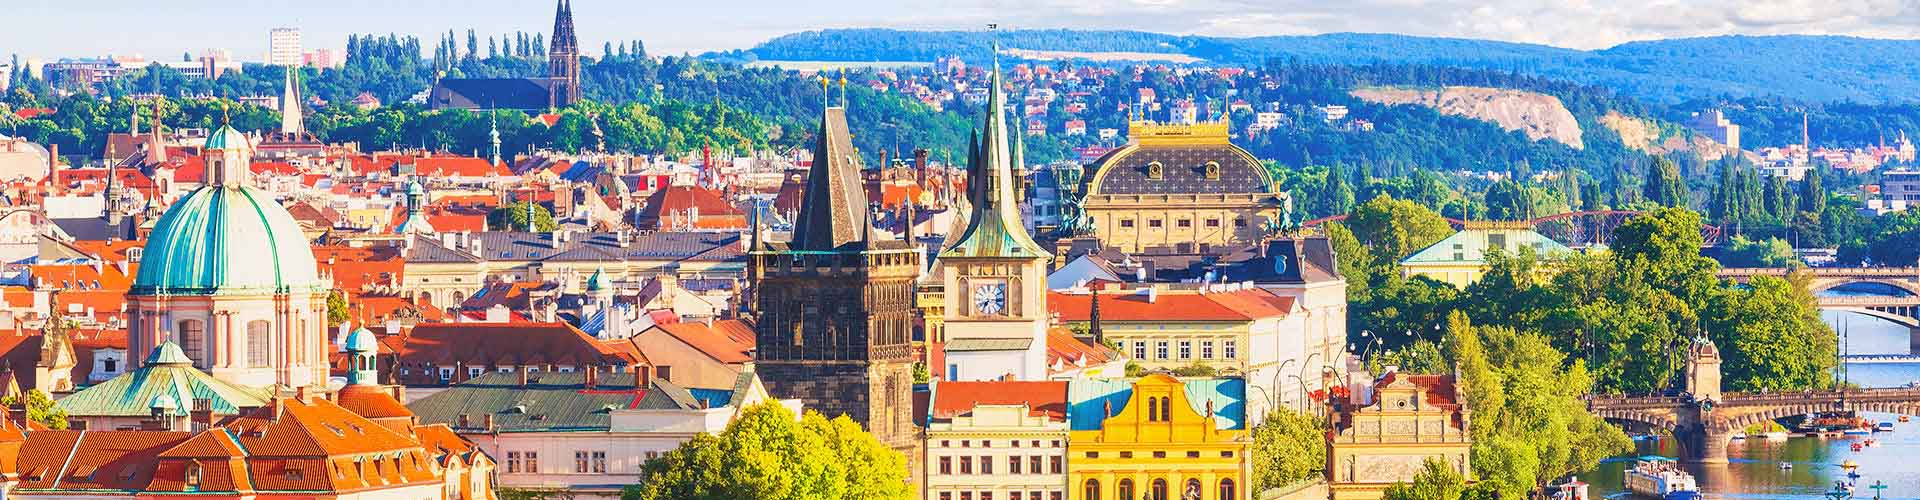 Praga - Albergues Juveniles en Praga. Mapas de Praga, Fotos y Comentarios para cada Albergue en Praga.